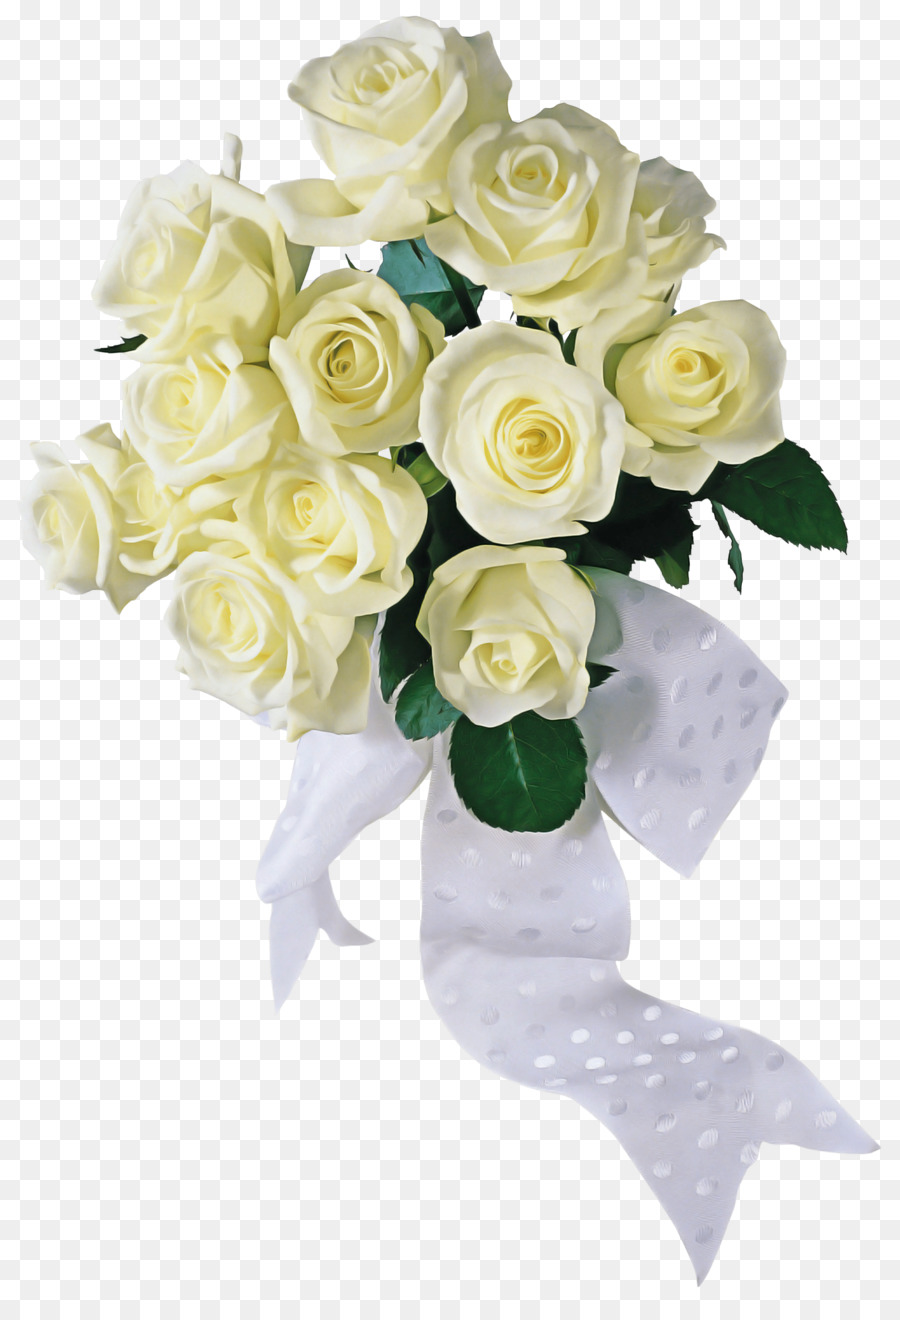 Descarga gratuita de Flor, Ramo, Rosa Imágen de Png